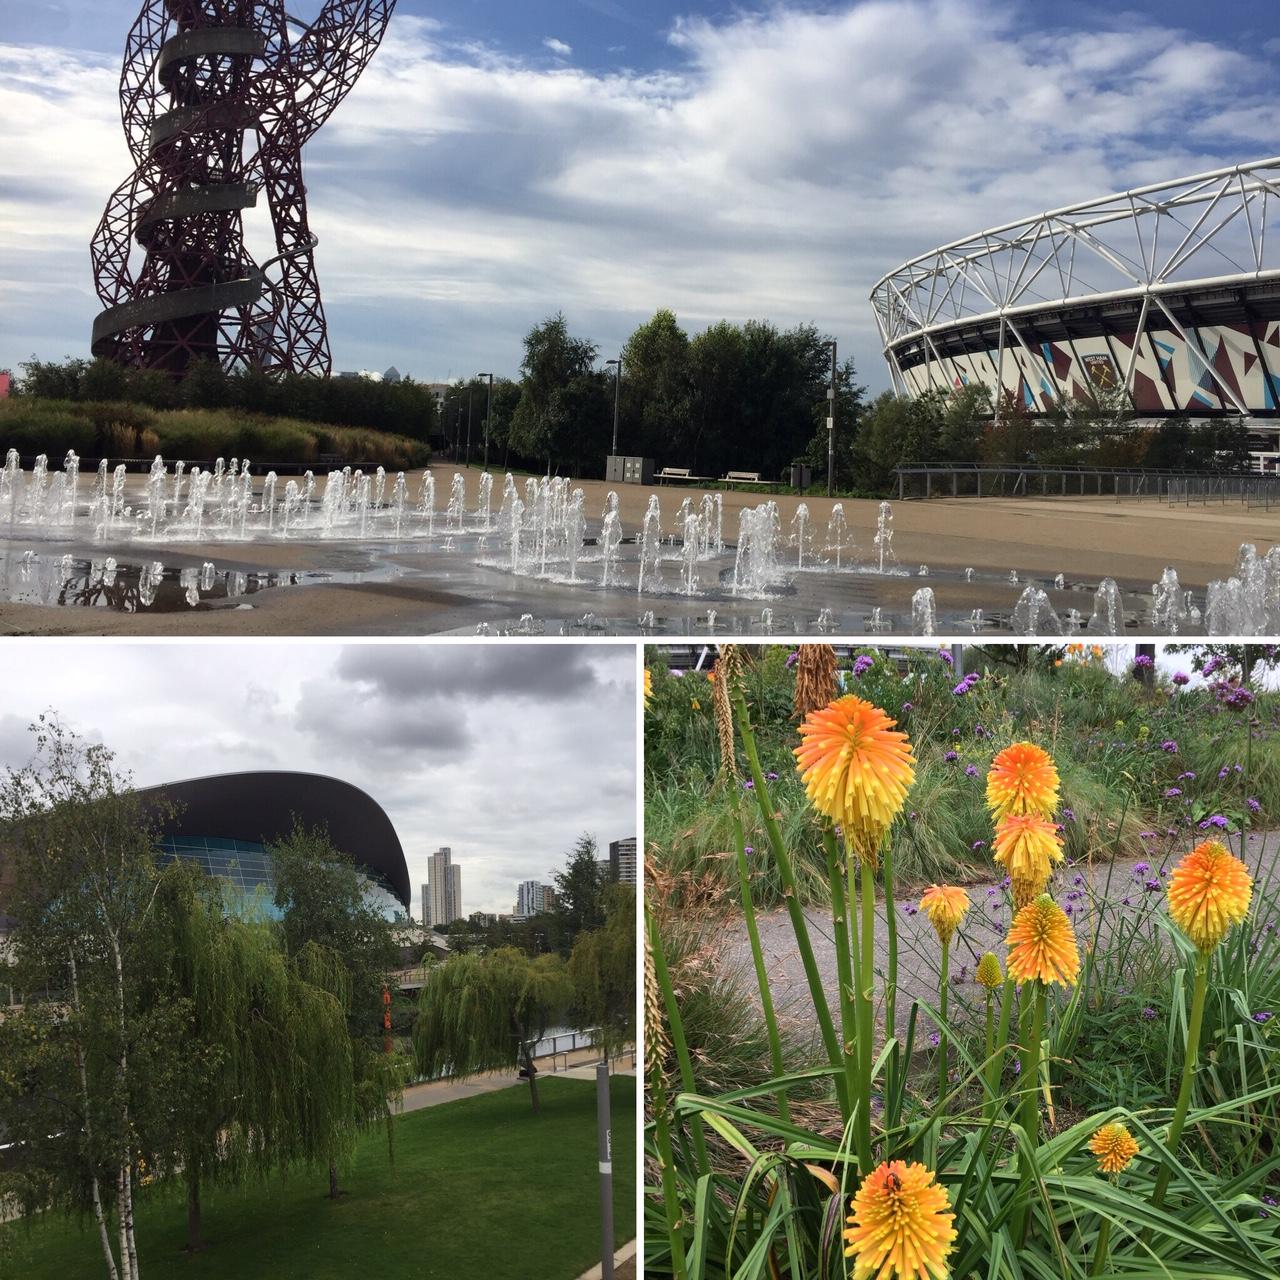 Olympic Park 2